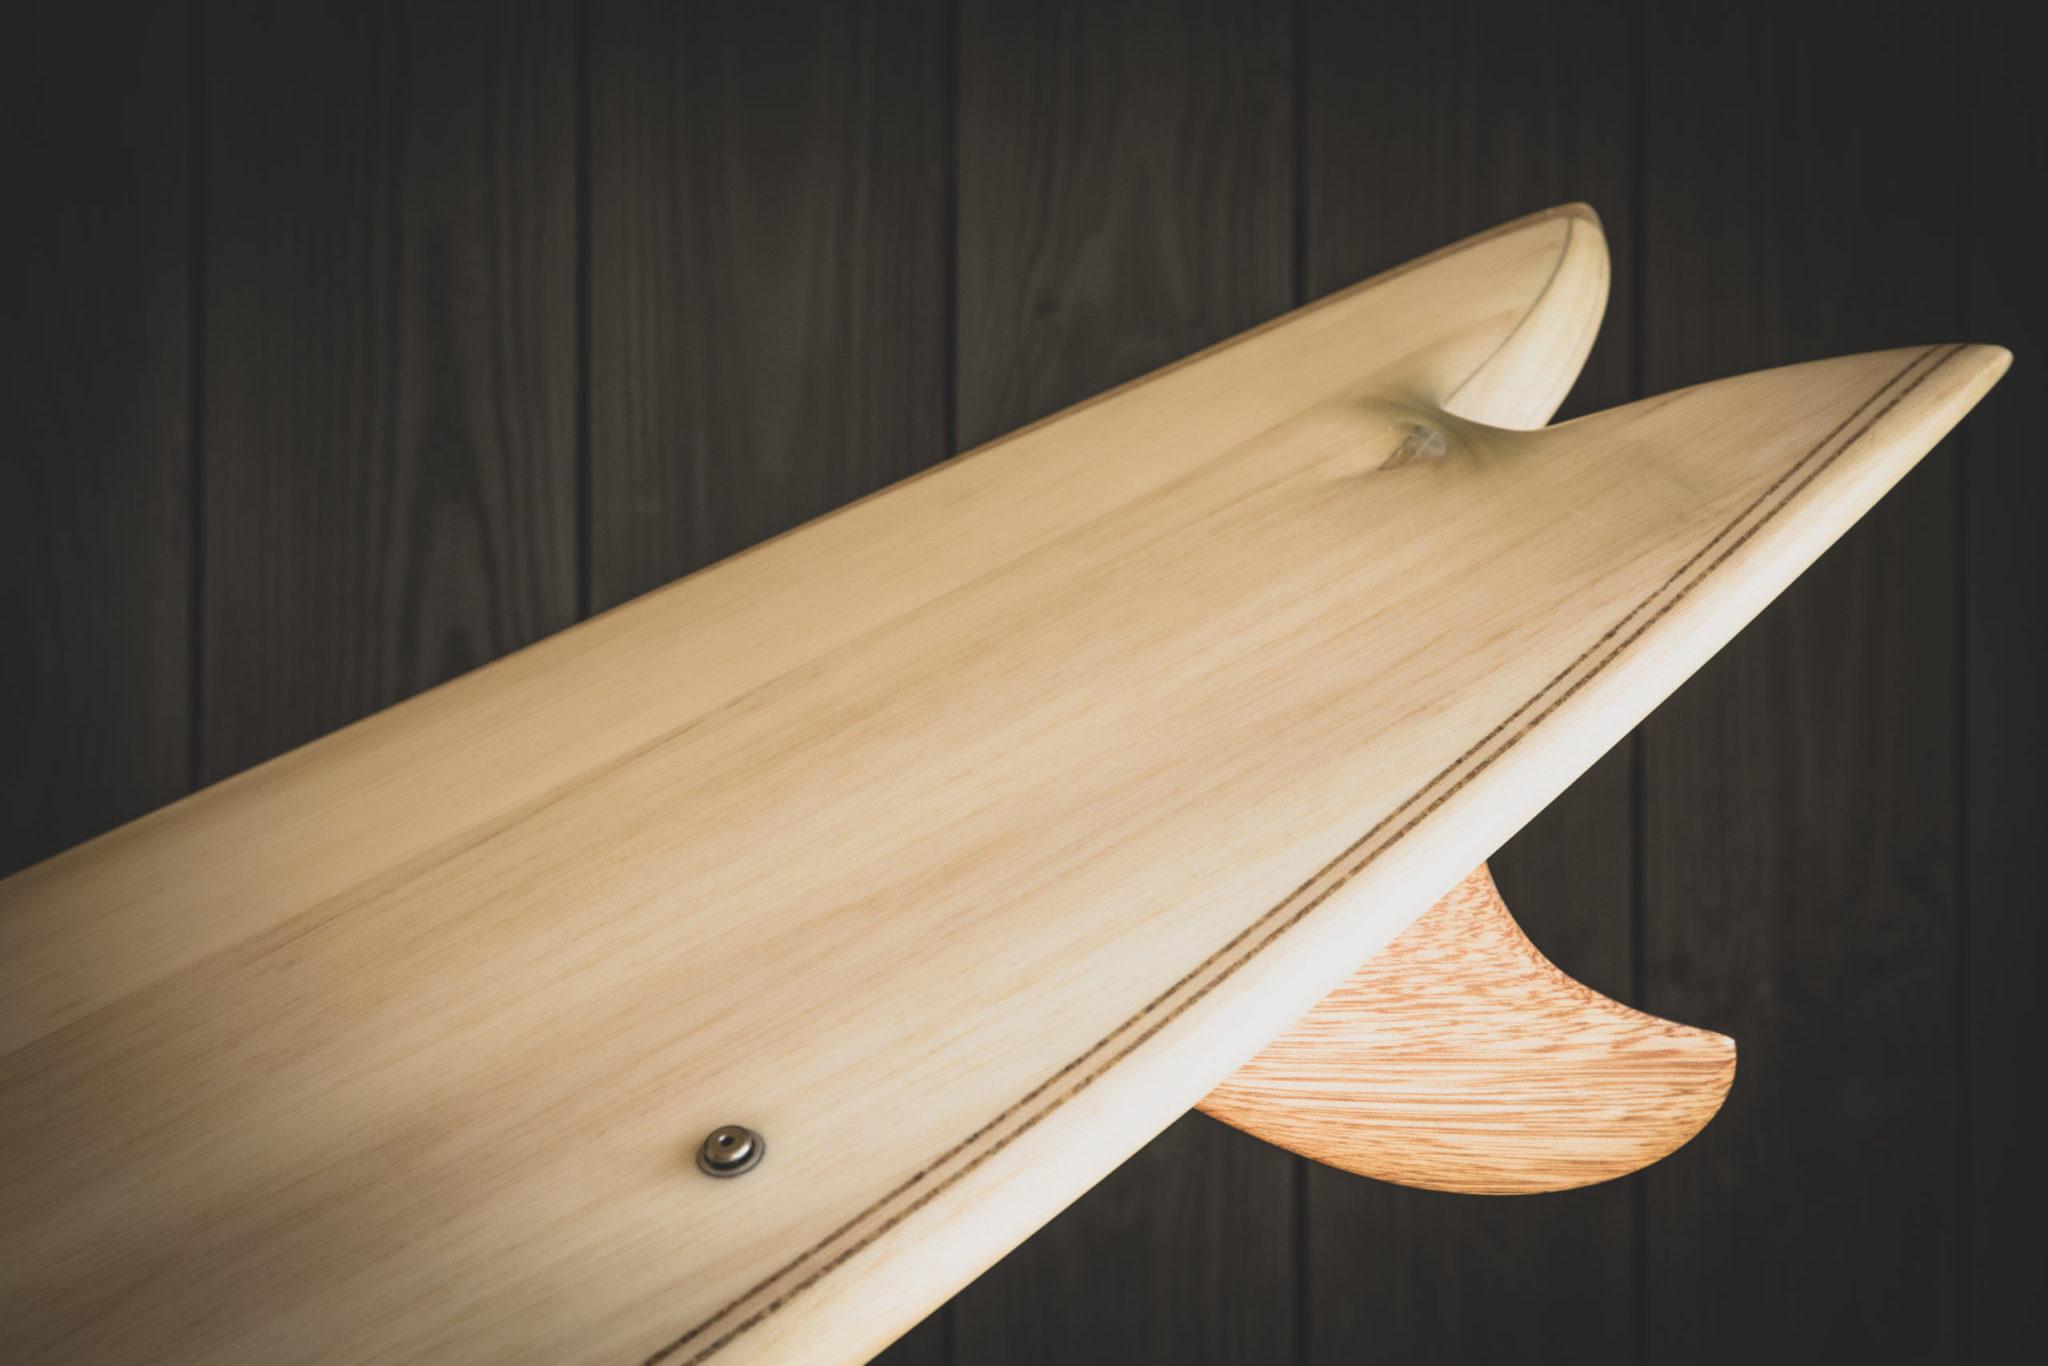 cachalot surfboards planche surf handmade artisan shaper hollow bois quiver haddock balsa